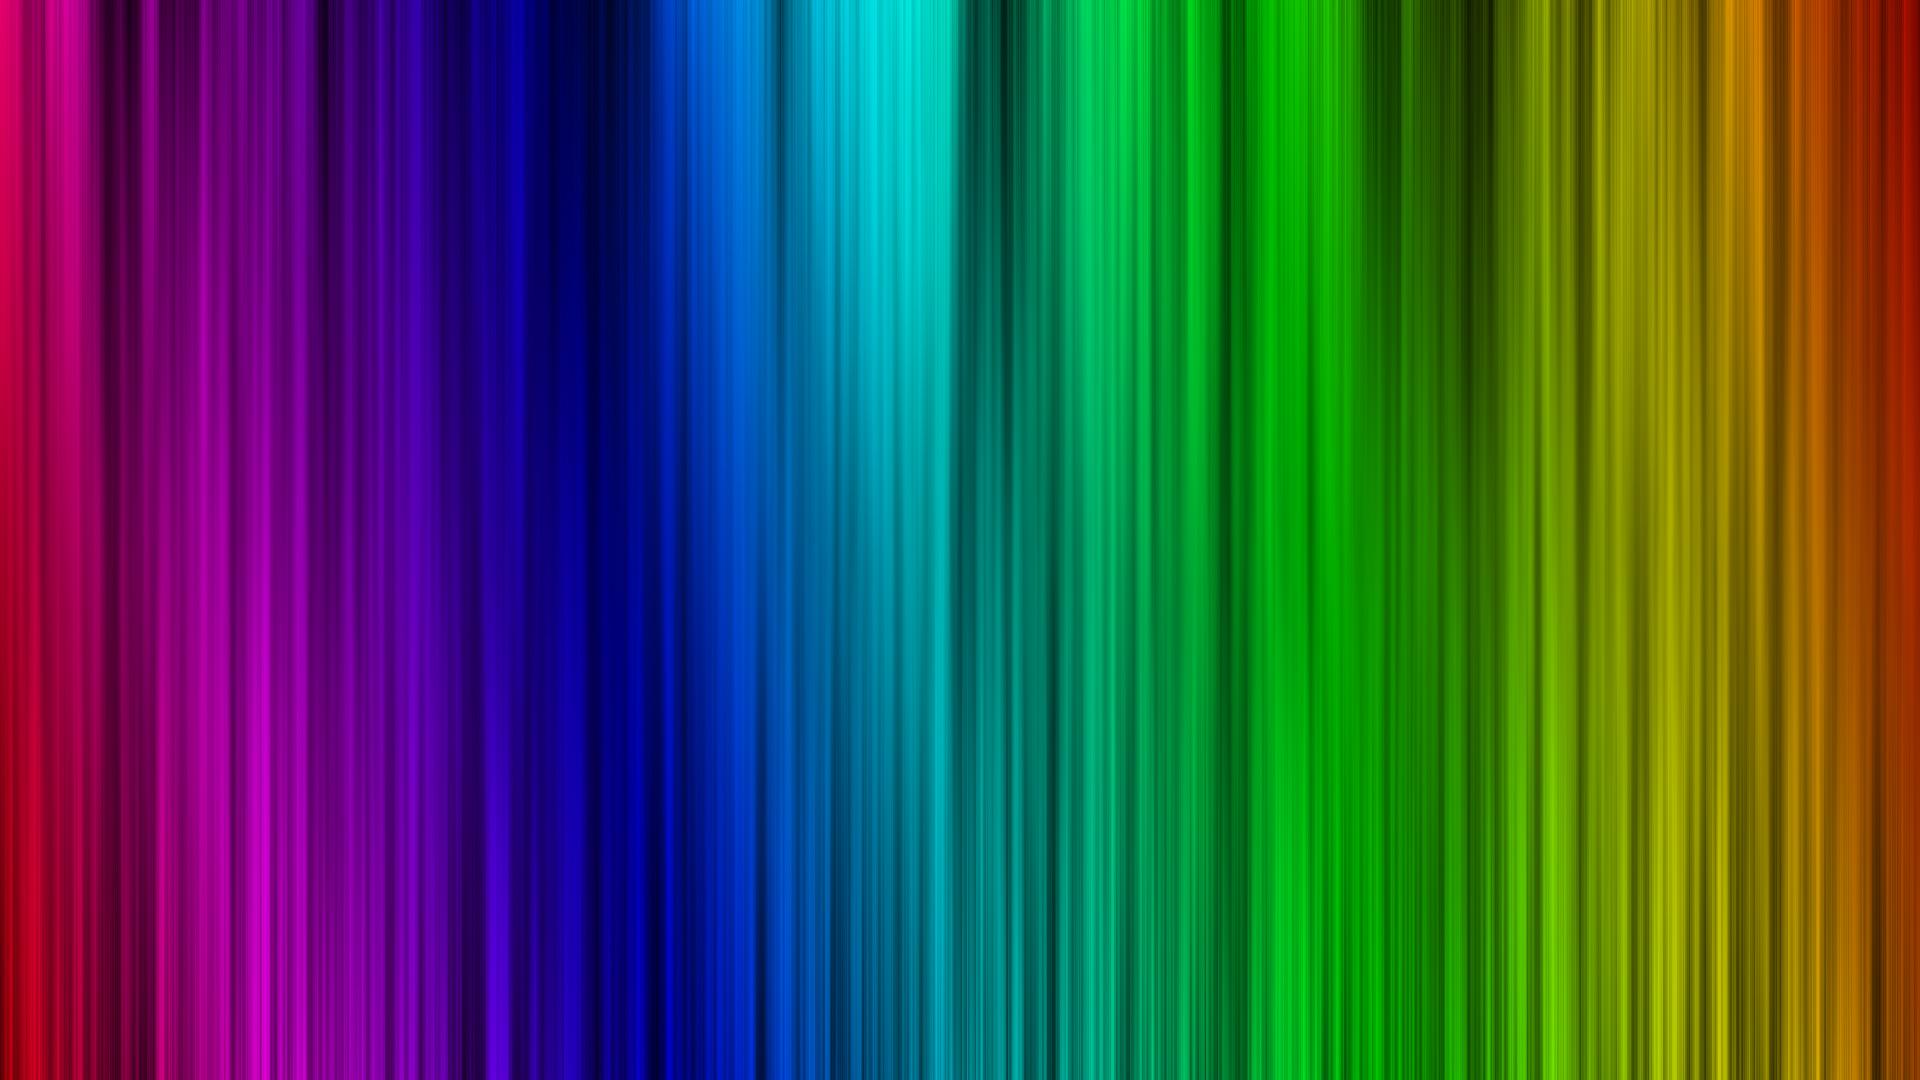 quelles sont les couleurs de l 39 arc en ciel les questions m t o. Black Bedroom Furniture Sets. Home Design Ideas